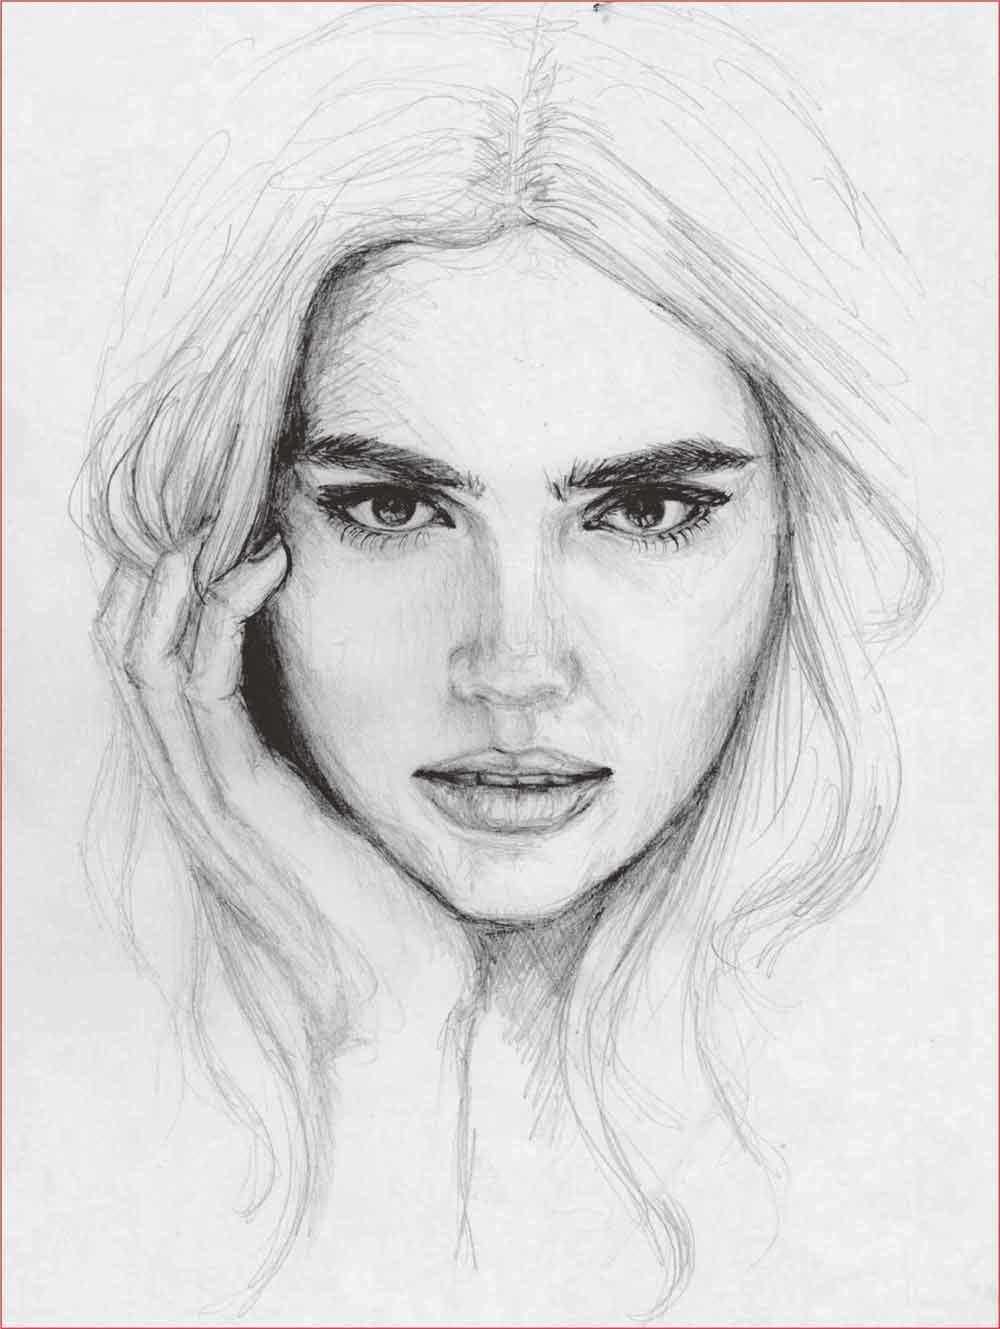 Gambar Wajah Manusia : gambar, wajah, manusia, Sketsa, Gambar, Wajah, Manusia, Mudah, Terbaik, Koleksi, Terlengkap